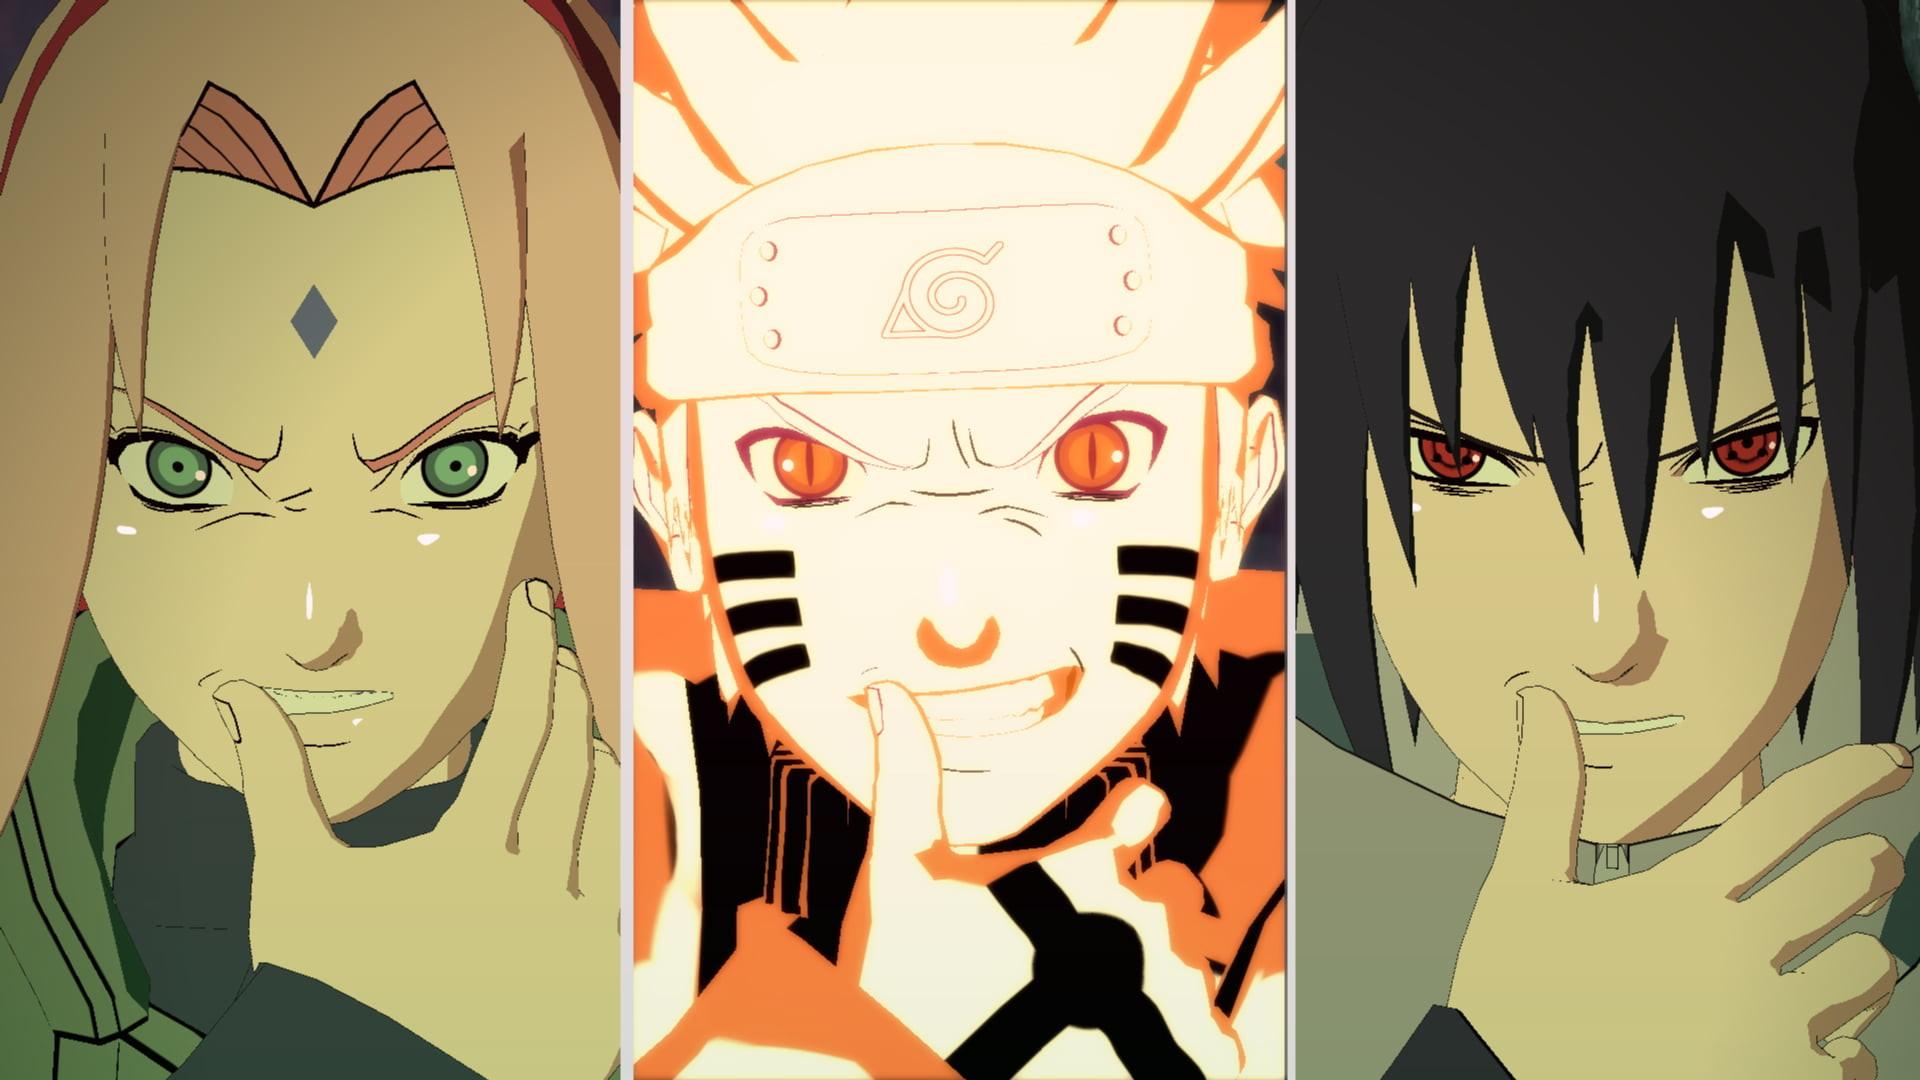 Res: 1920x1080, Naruto, Sasuke, and Sakura collage HD wallpaper